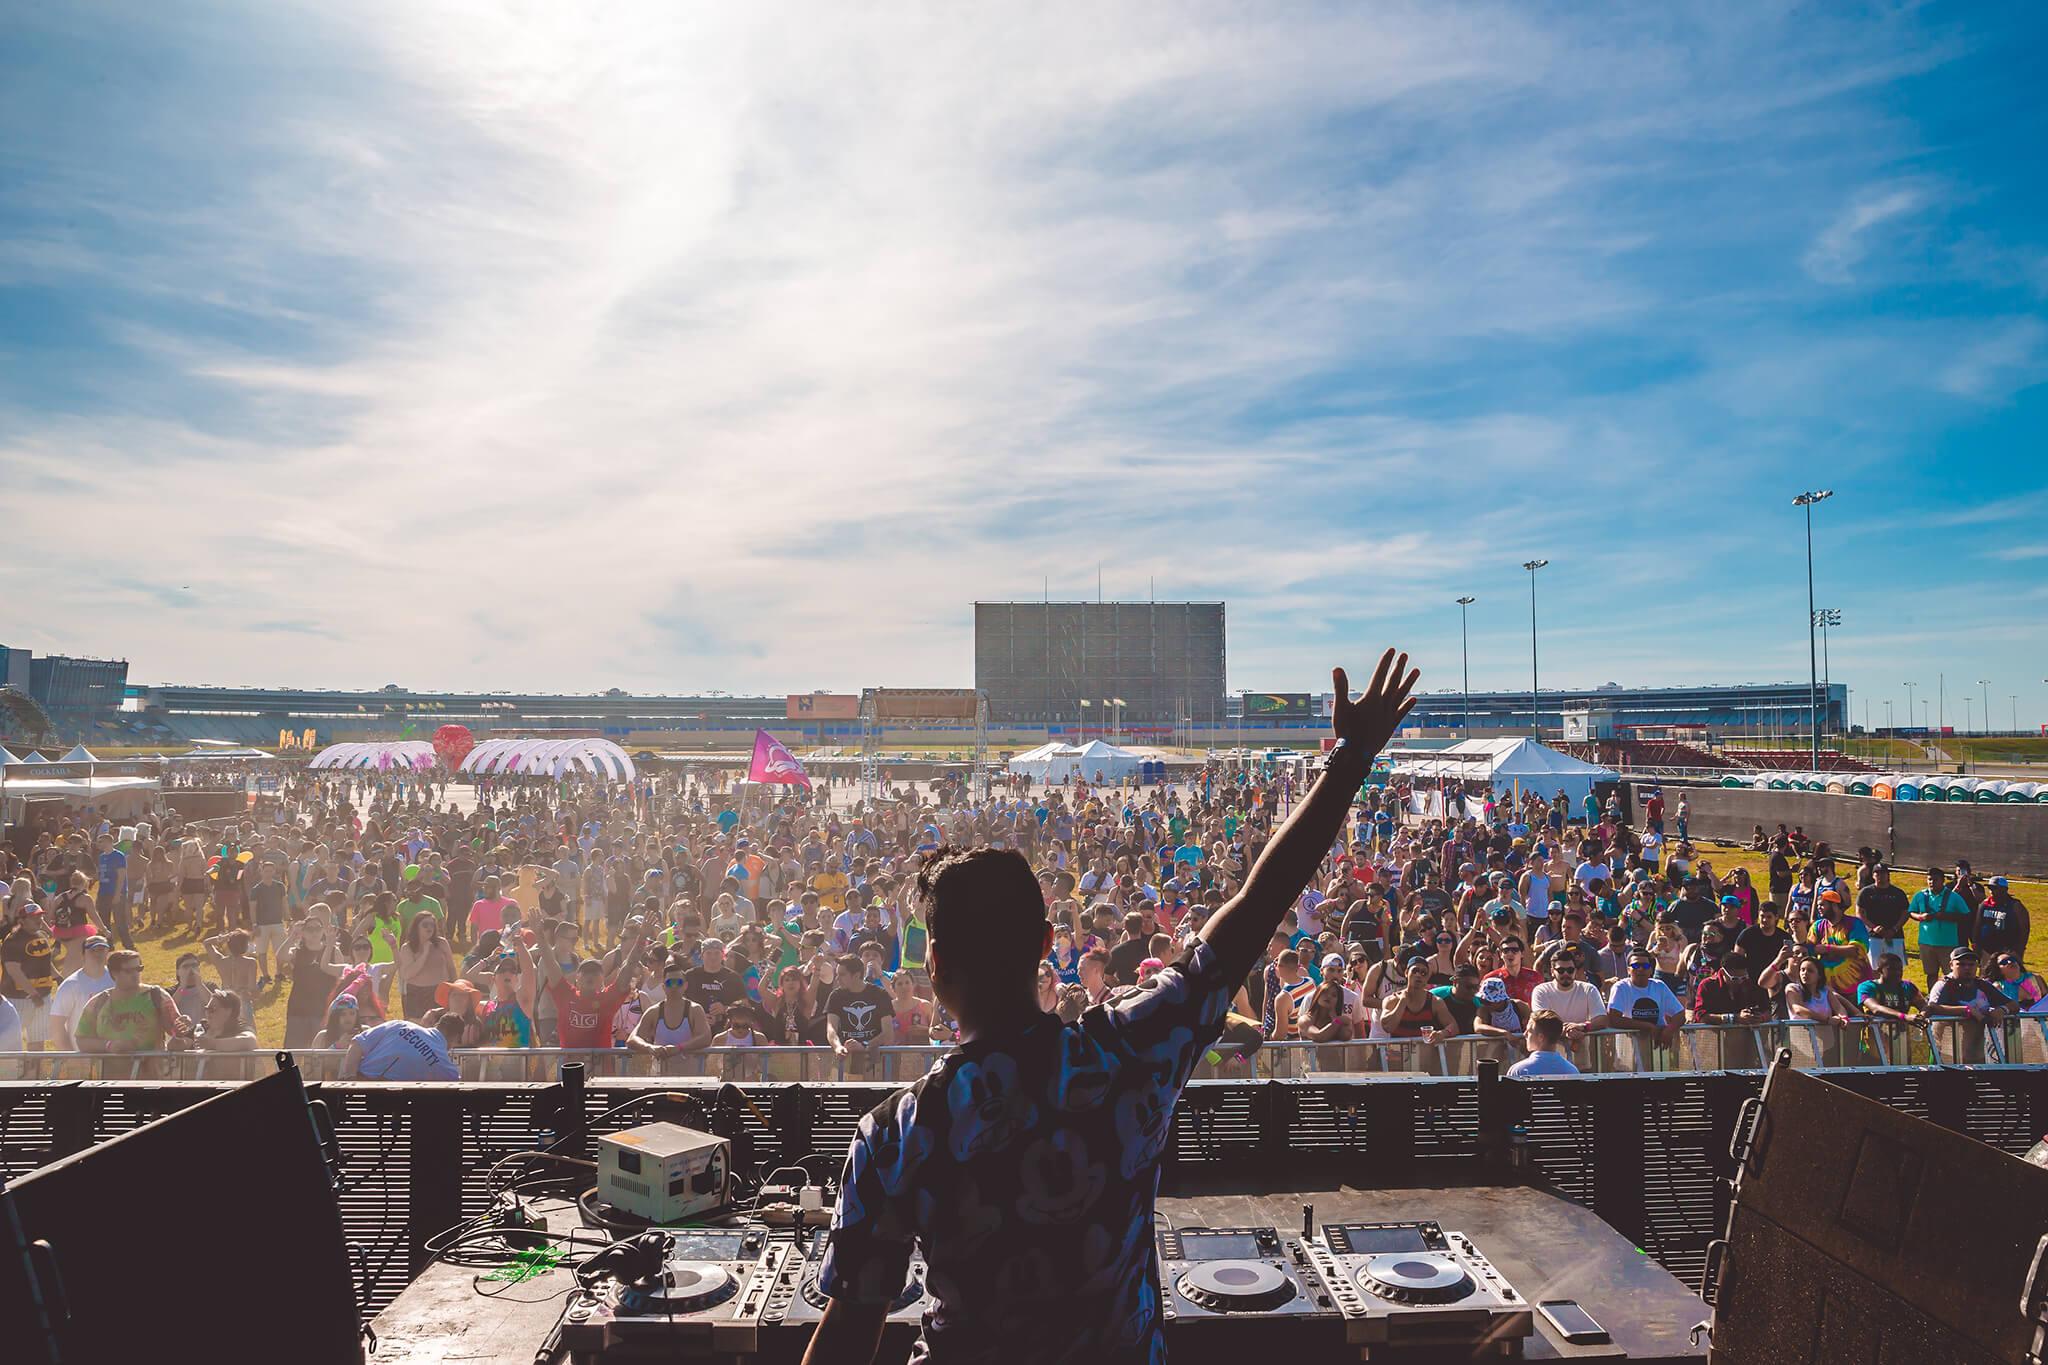 DJ on stage at Something Wonderful festival